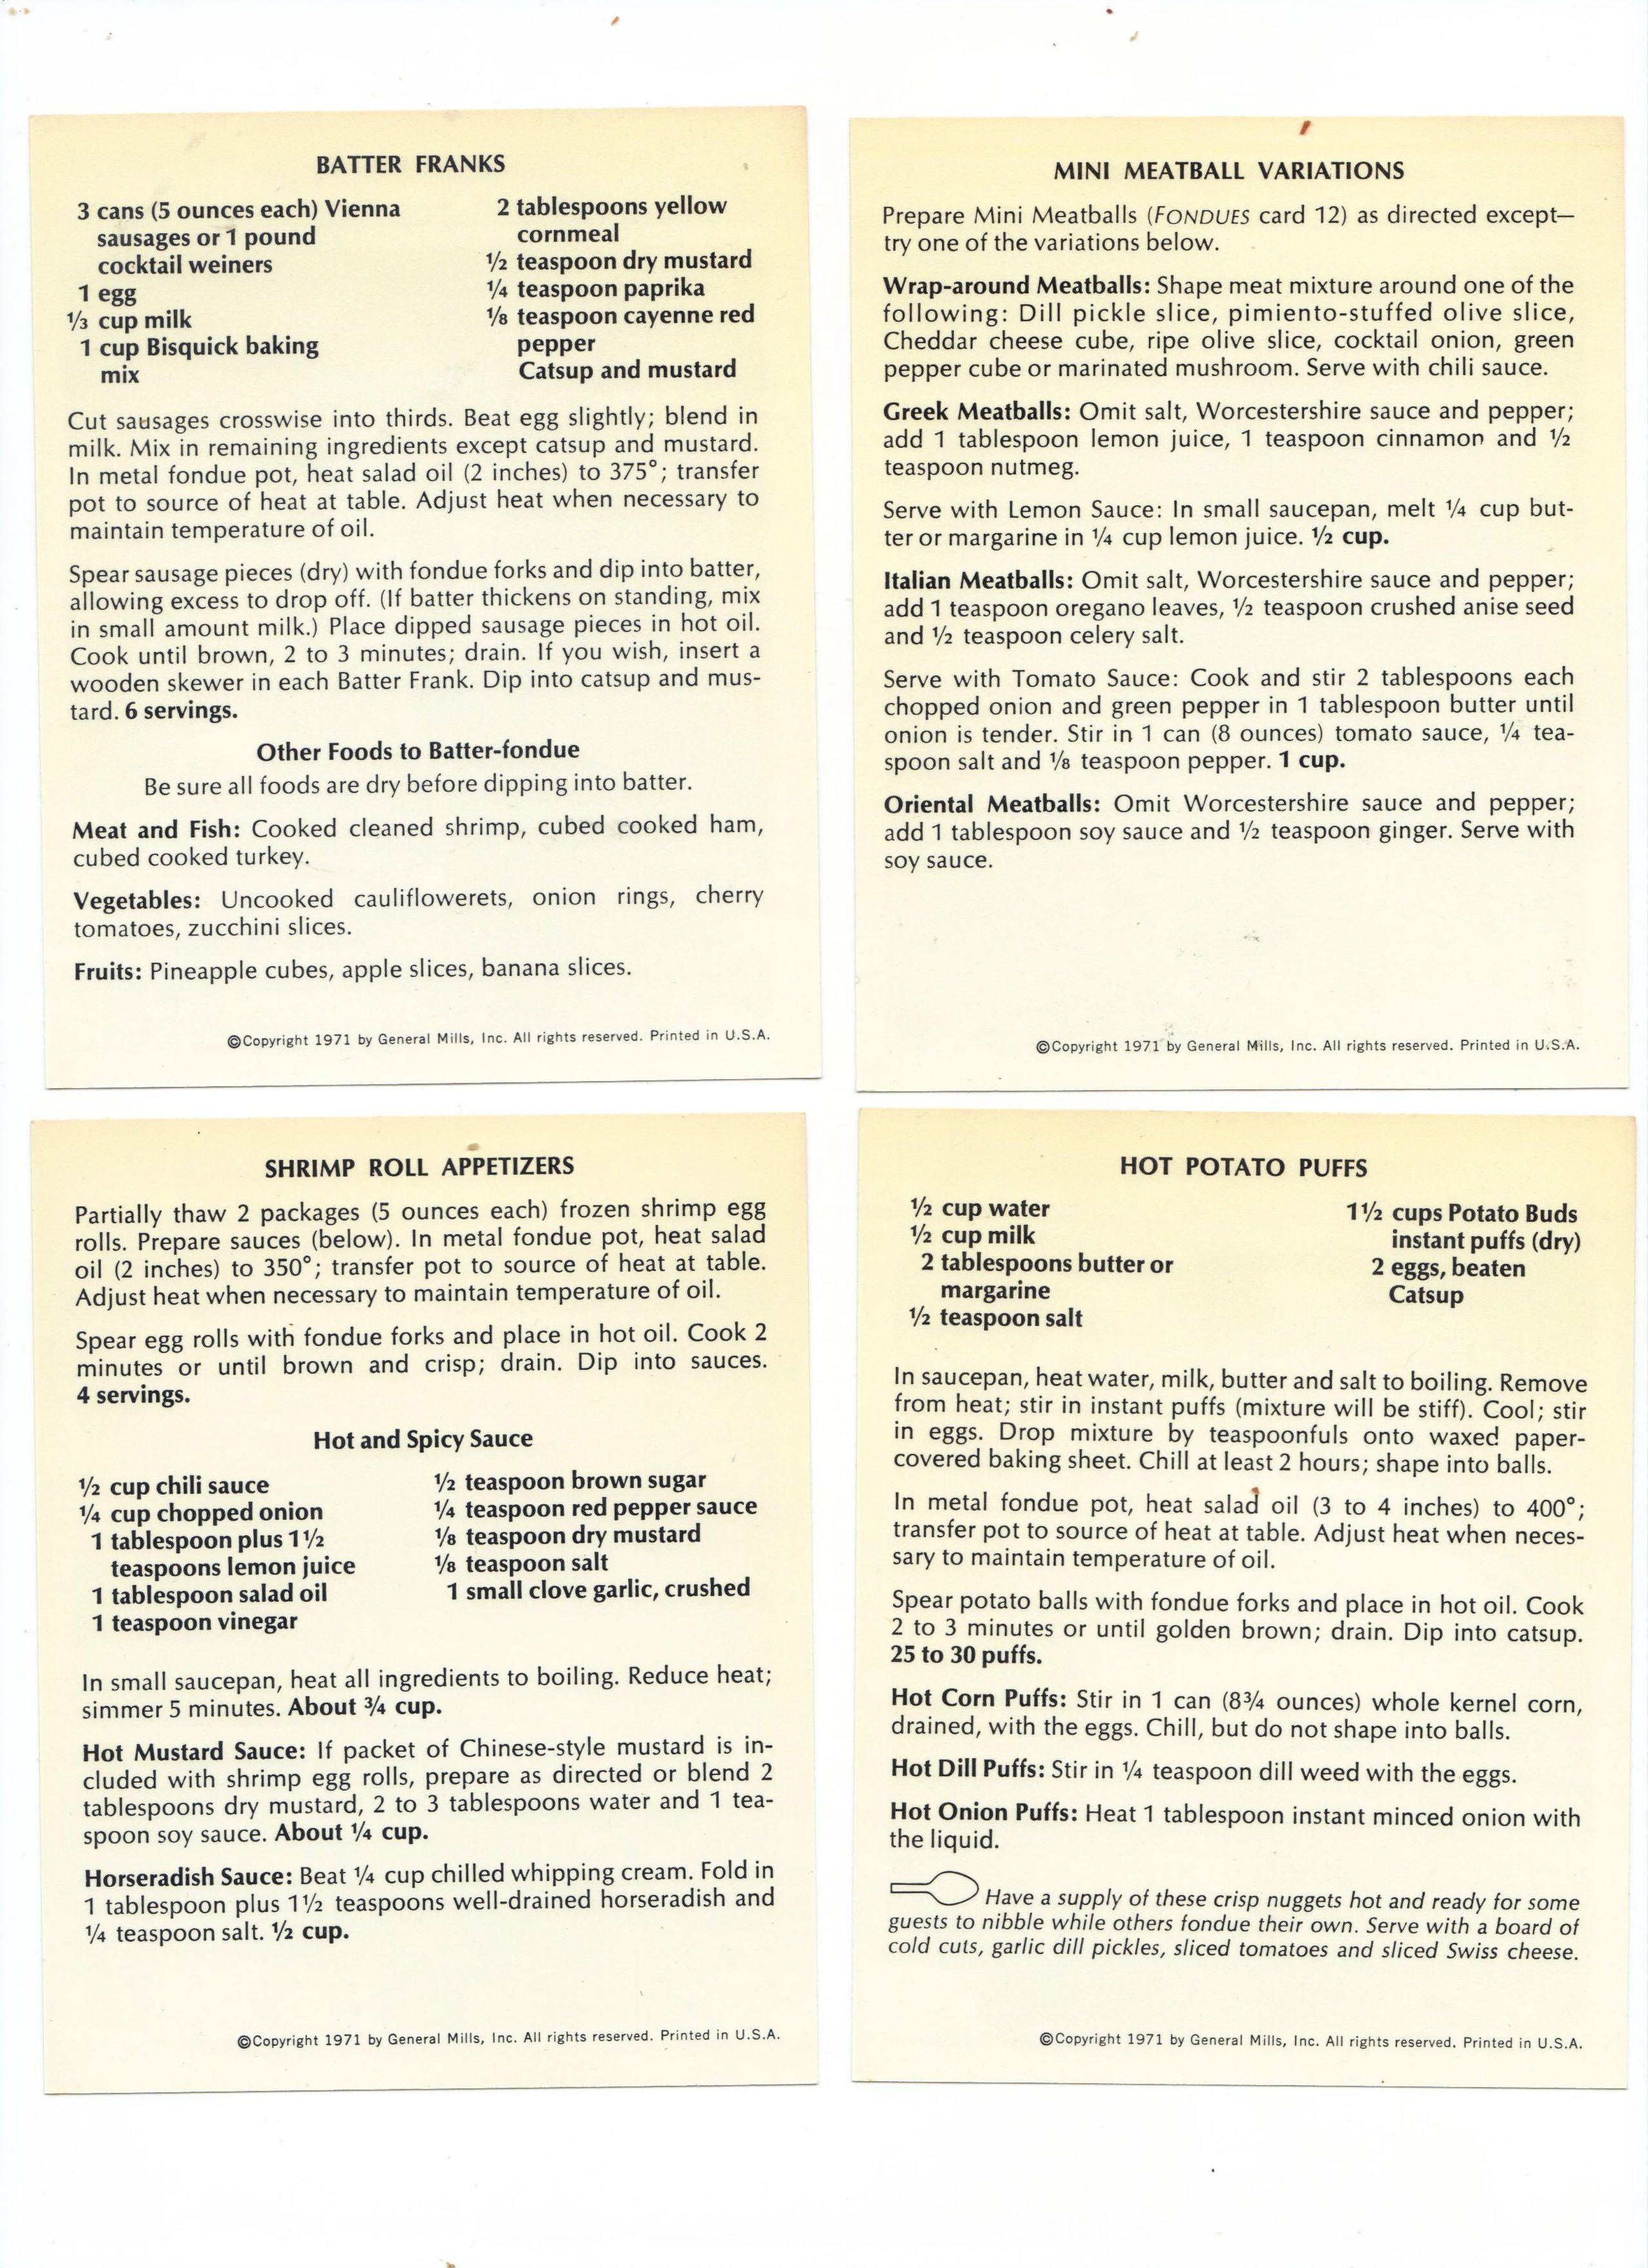 26 Vintage Fondue Recipes #meatfonduerecipes 26 Vintage Fondue Recipes #meatfonduerecipes